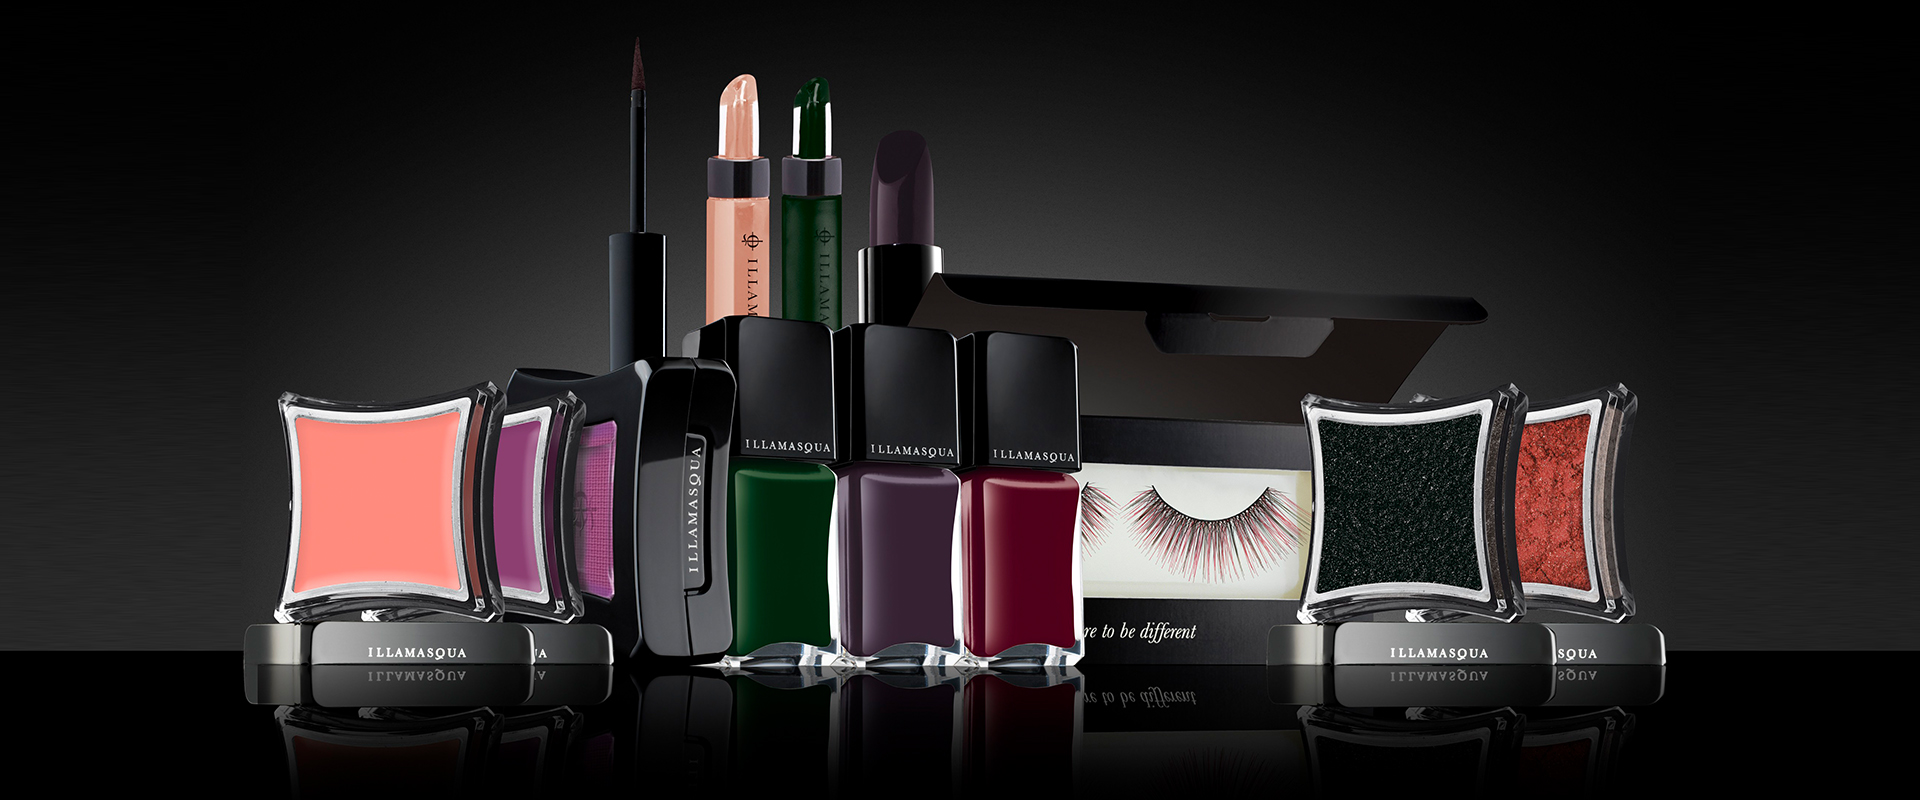 Illamasqua - curventa - makeup - range - brand - beauty - lipstick - foundation - nail polish